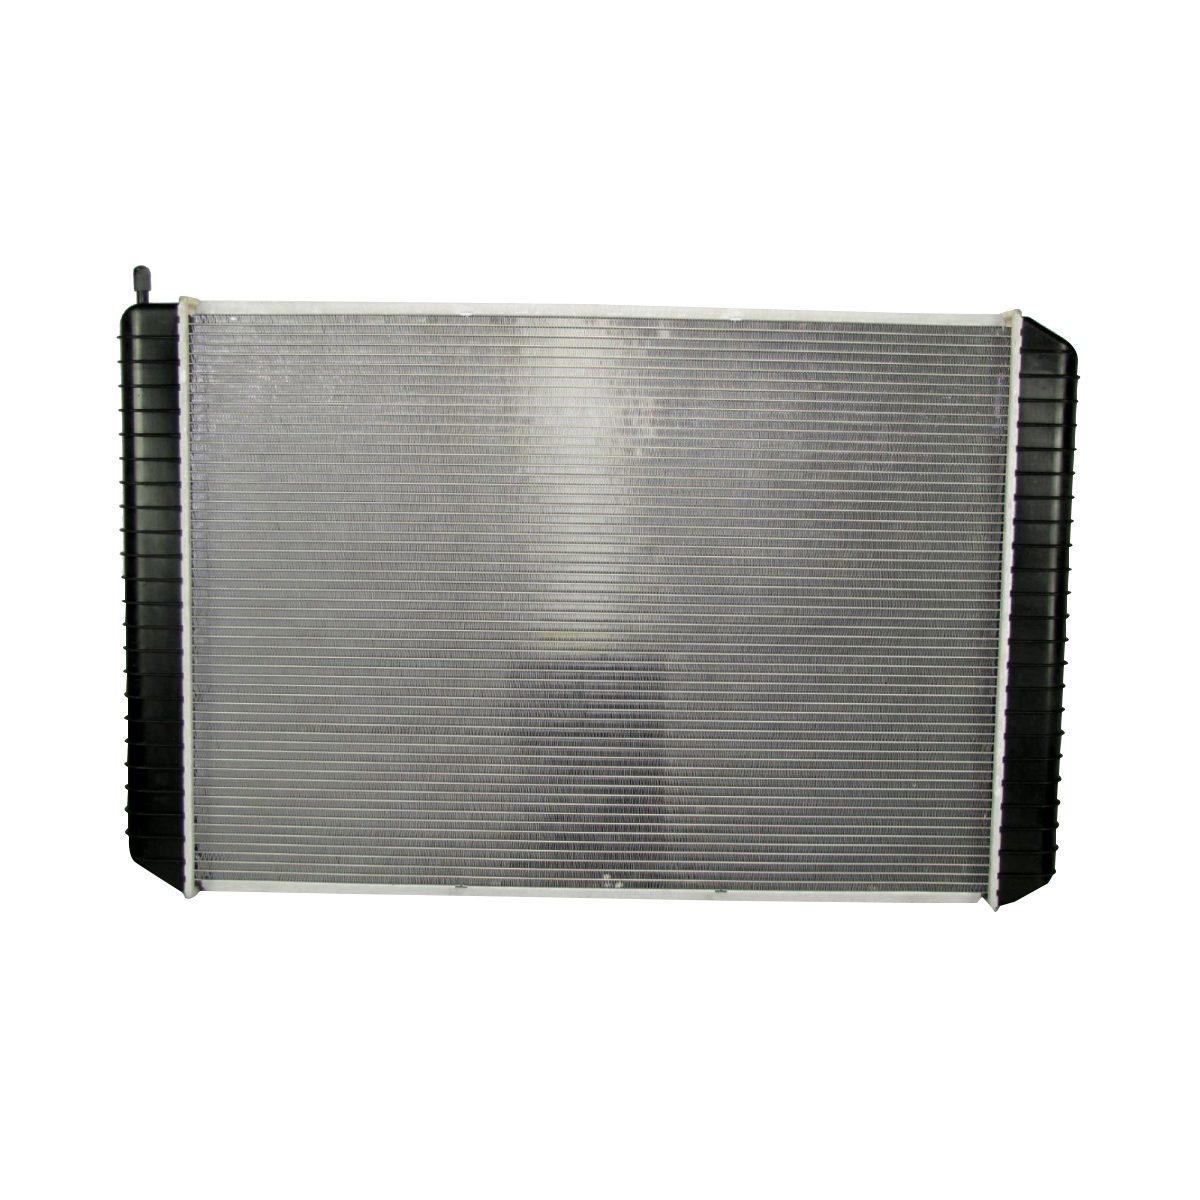 chevrolet gmc kodiak topkick 95 96 radiator oem gmc7334 2